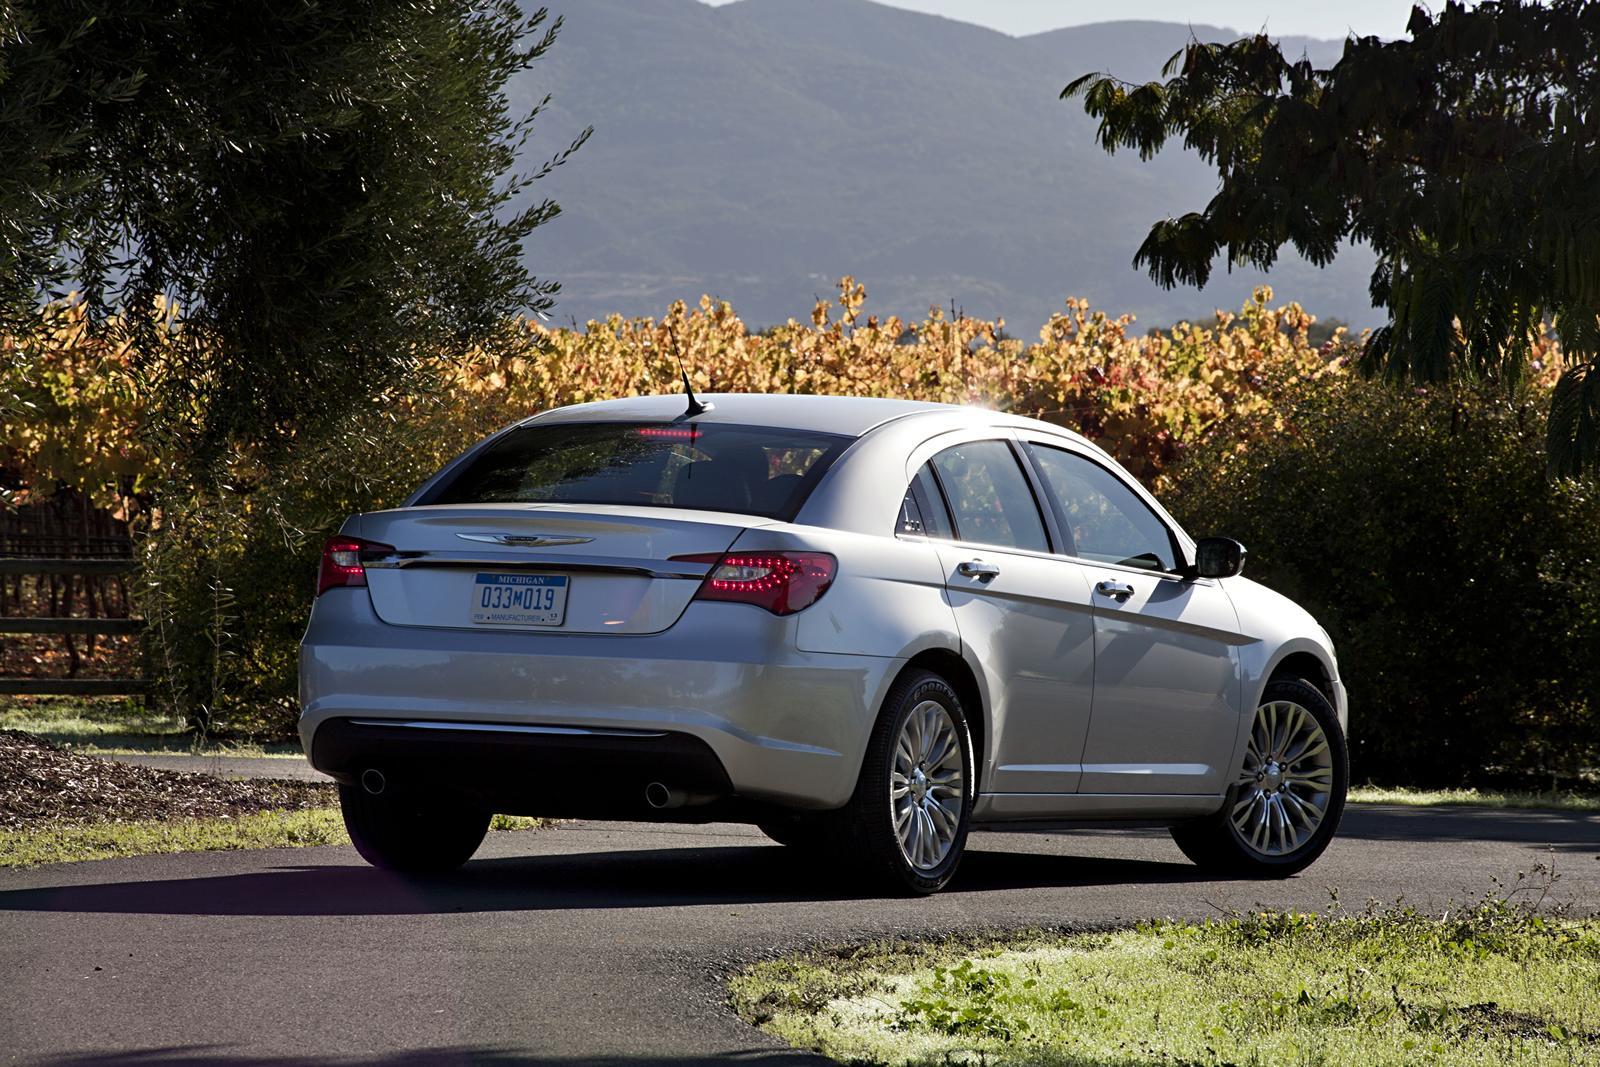 luxury car chrysler 200 2011 car modification review. Black Bedroom Furniture Sets. Home Design Ideas